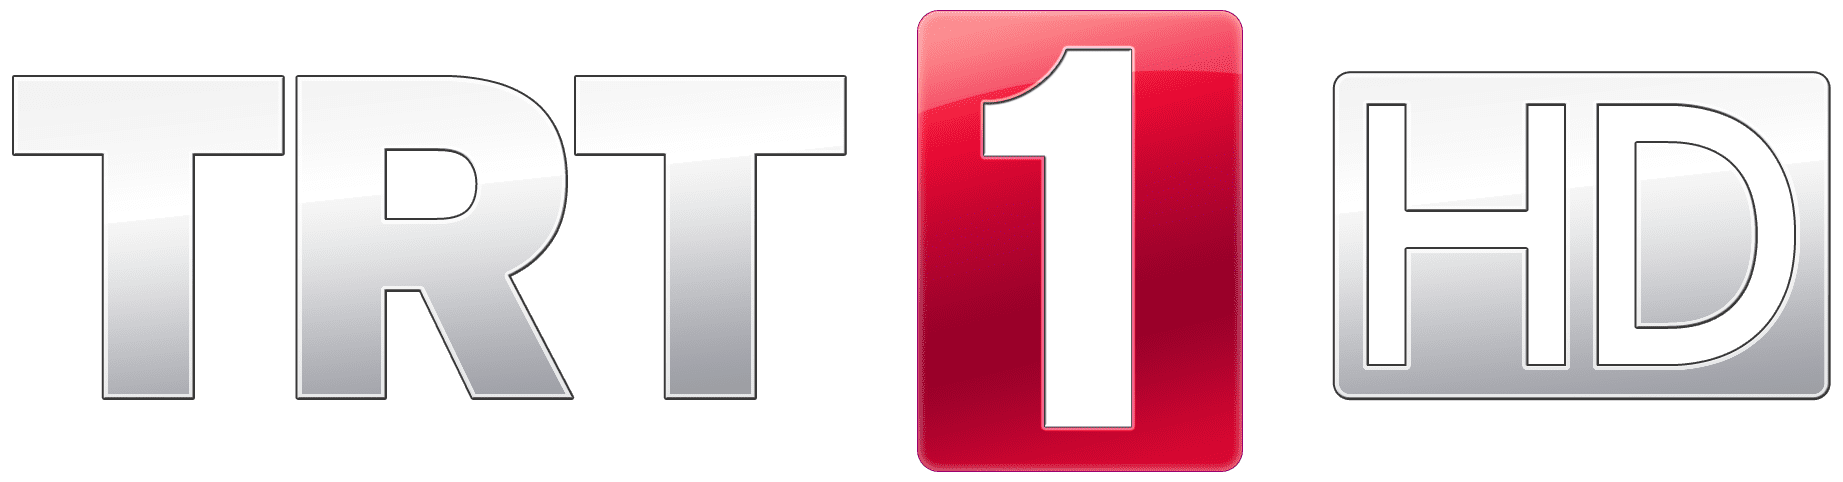 trt1-hd-logo